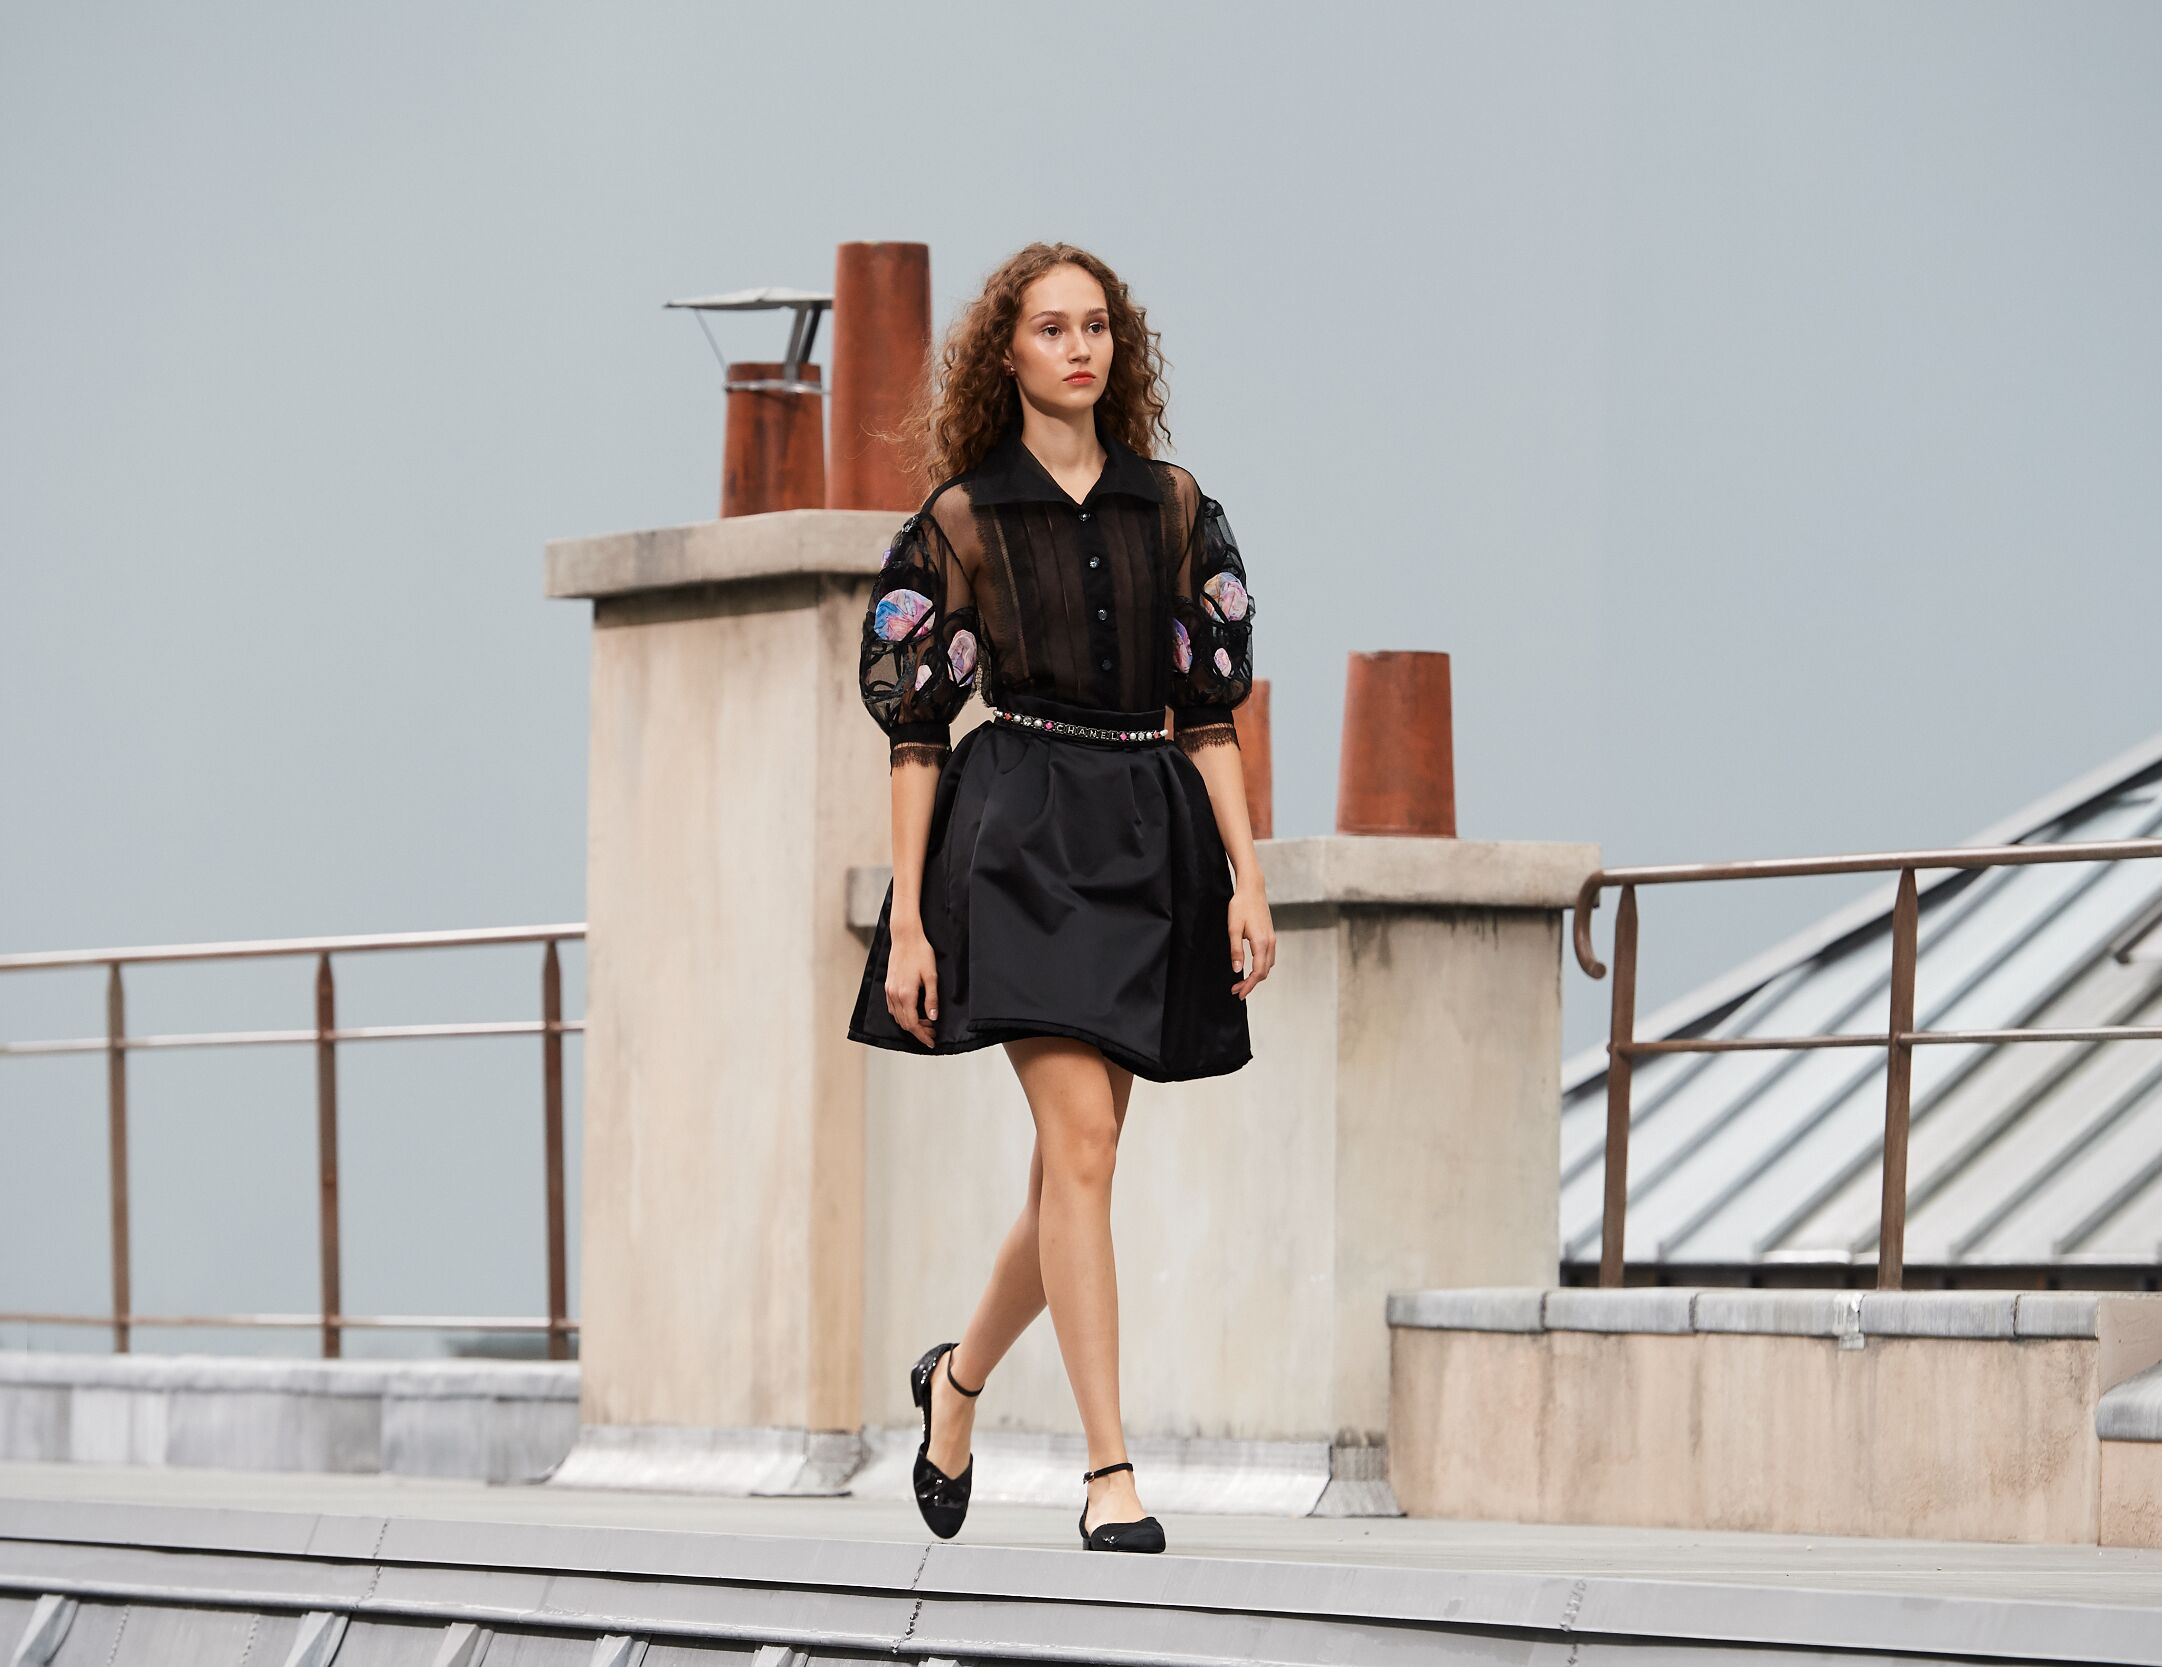 SS 2020 Chanel Show Paris Fashion Week Womenswear